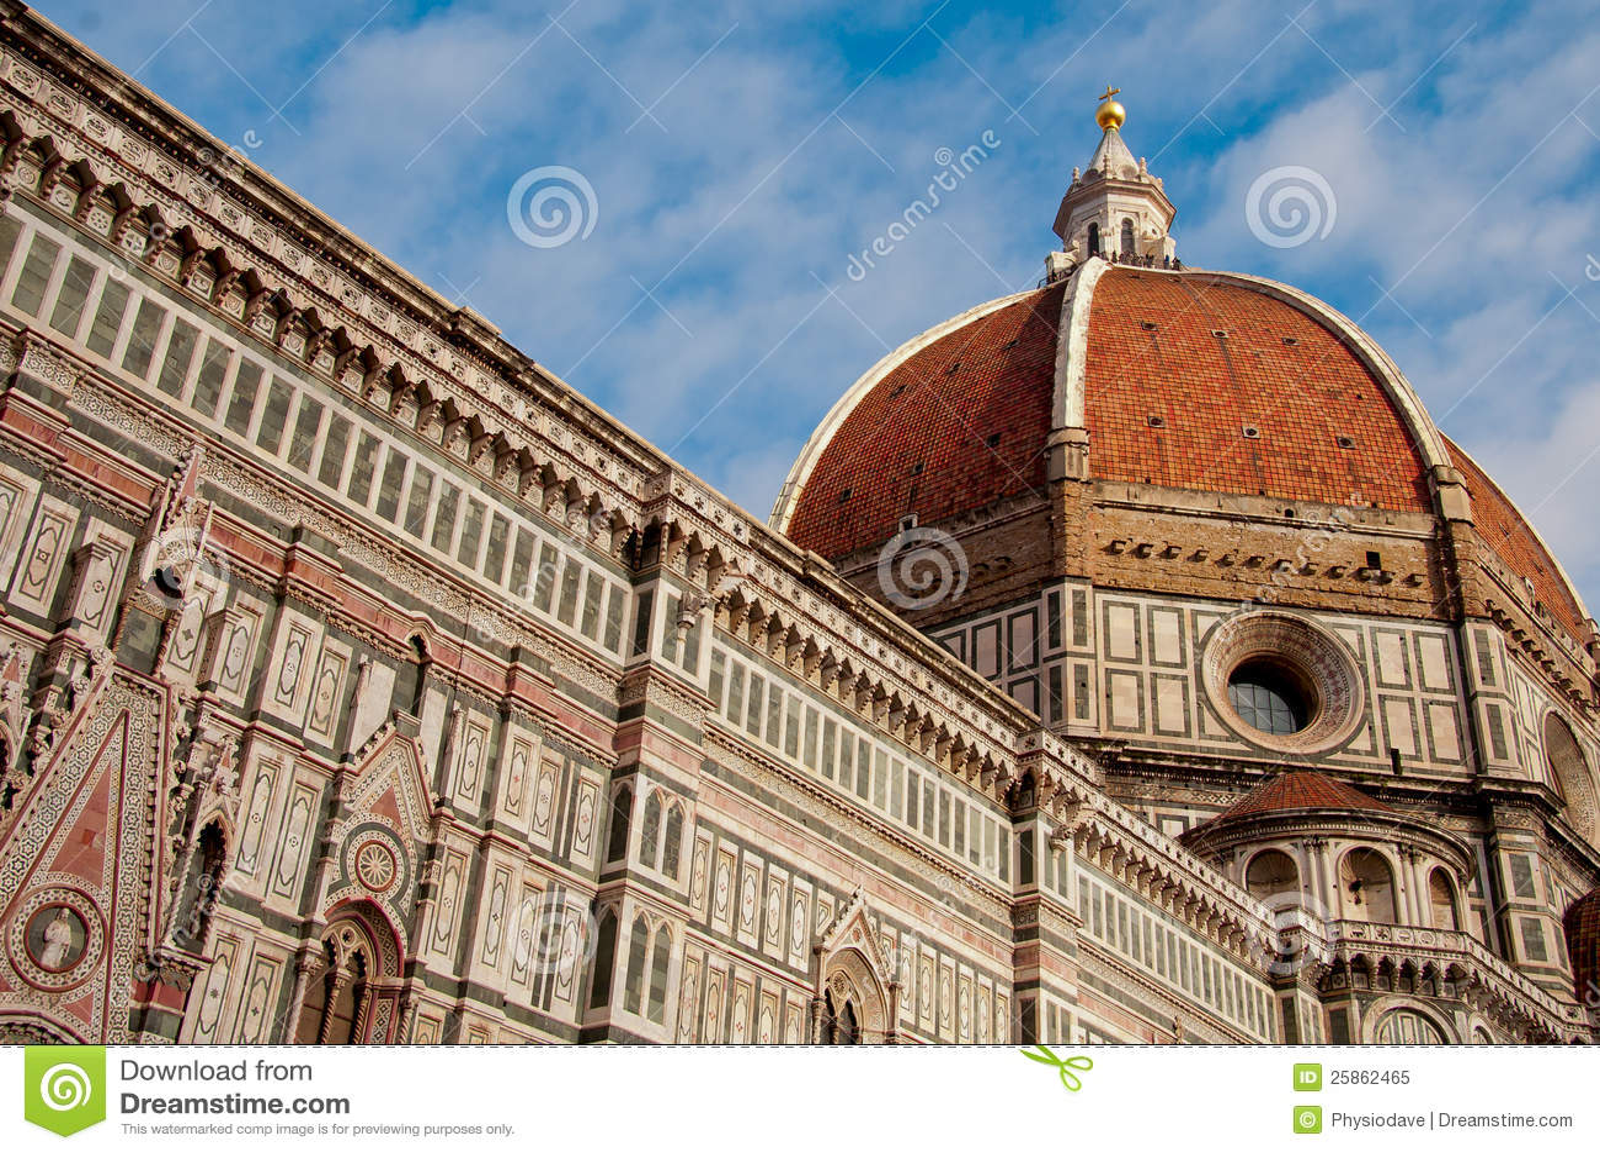 dome of basilica de san lorenzo florence stock image image 25862465. Black Bedroom Furniture Sets. Home Design Ideas